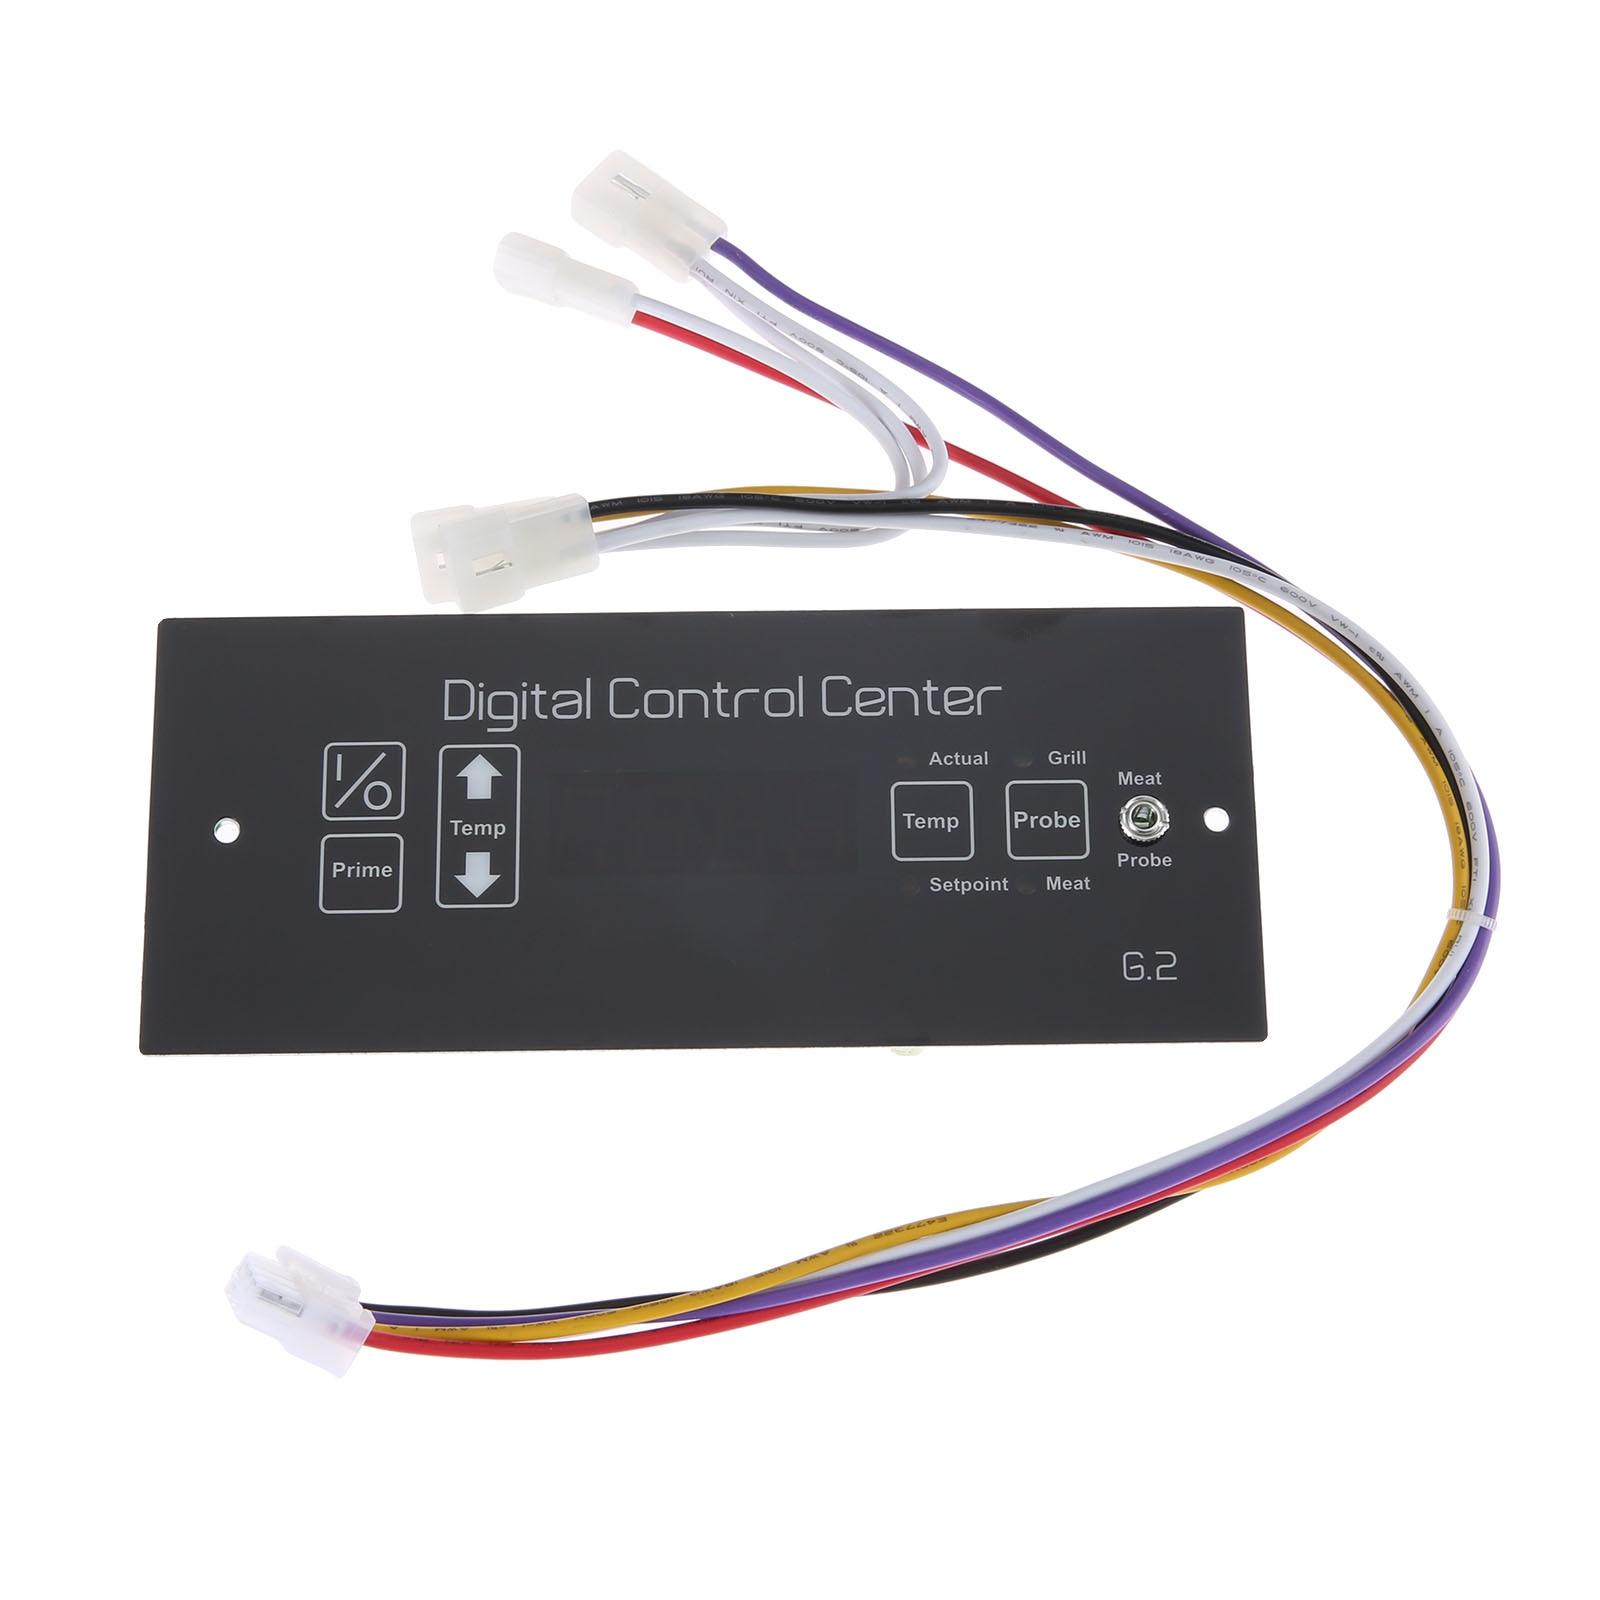 Digital Control Board 50125 Wire Harness fit for Louisiana Wood Pellet Grills LS-LG16006-F/C 120V